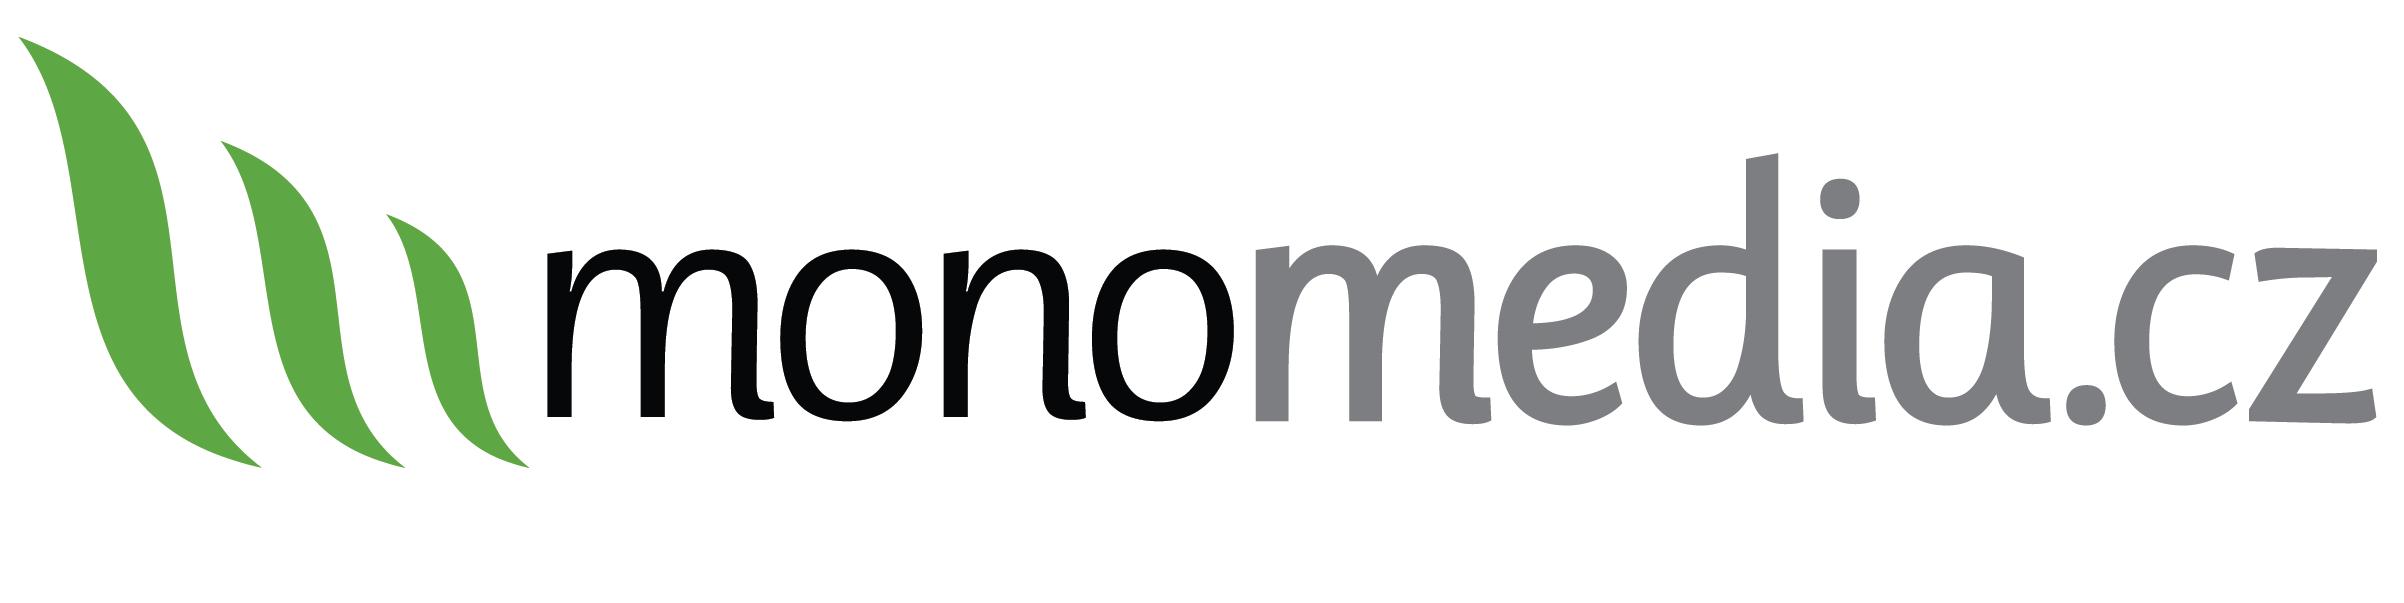 monomedia.cz